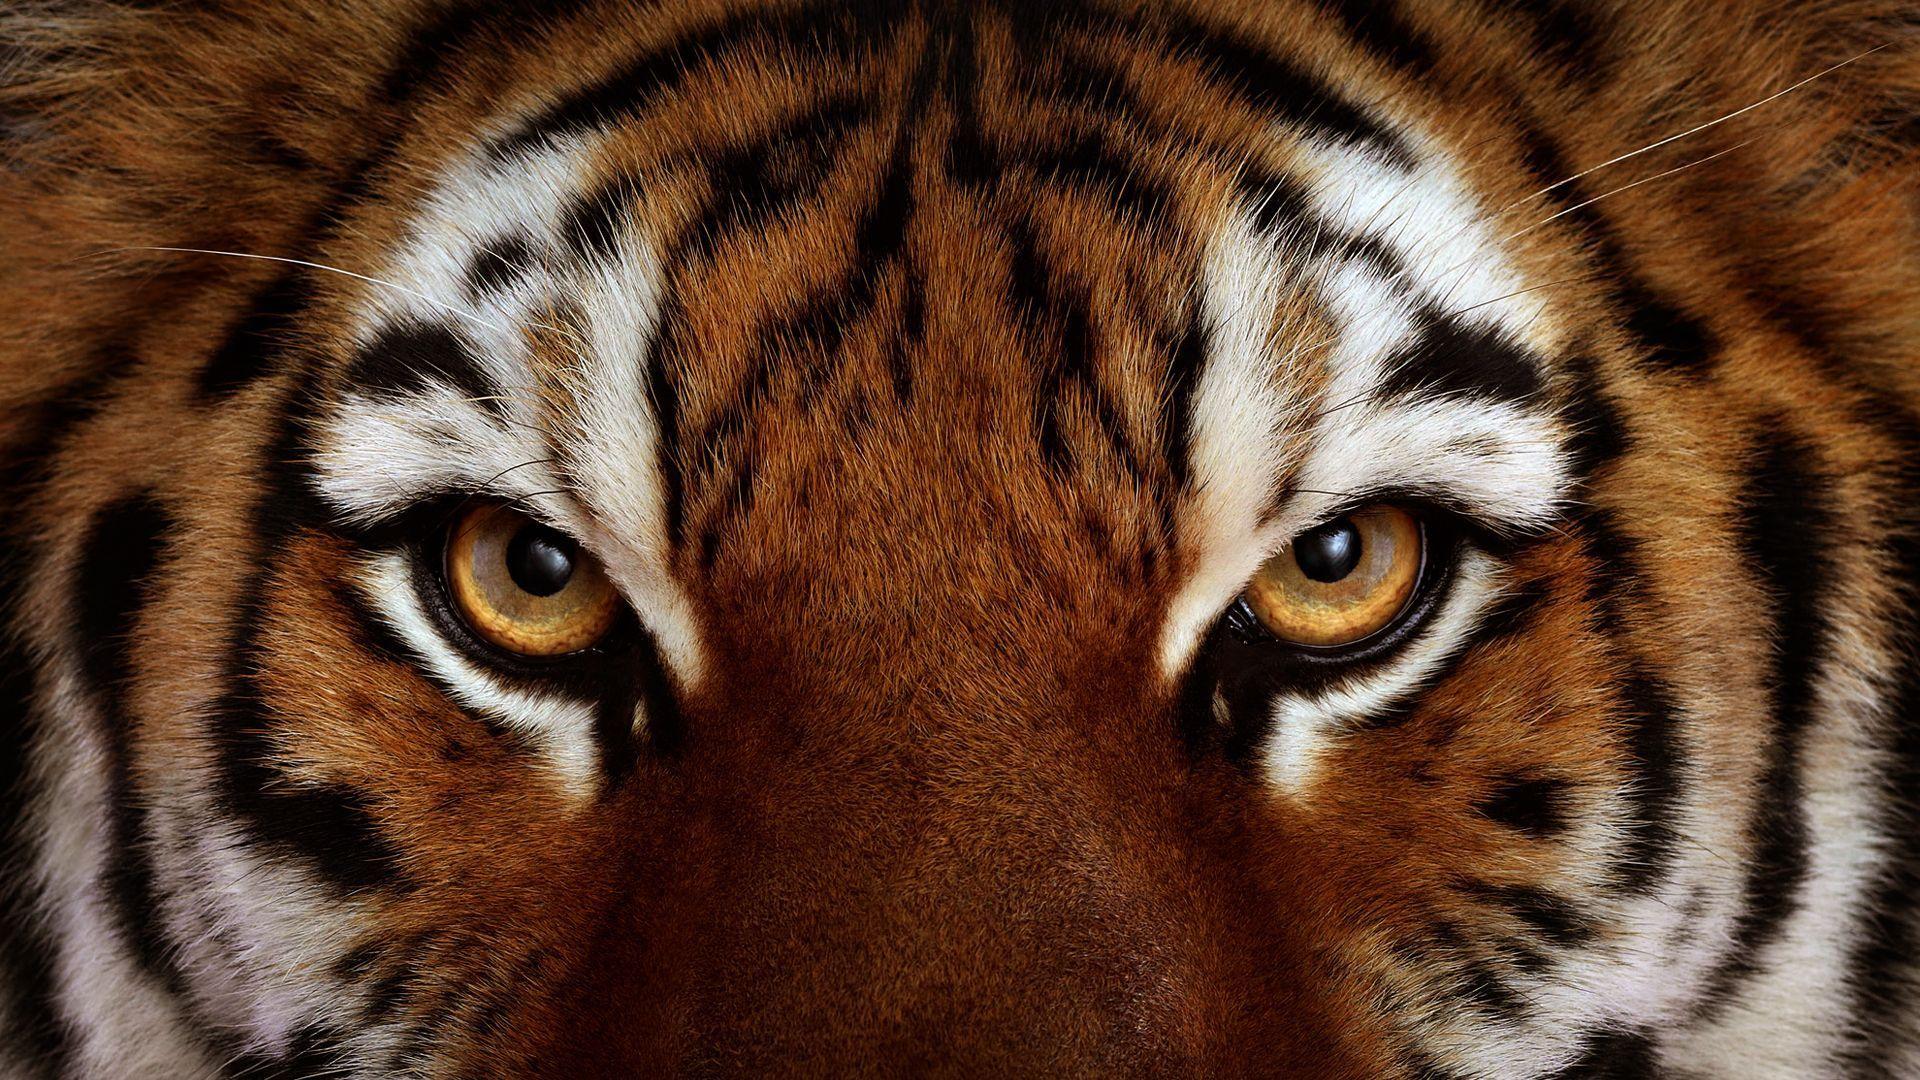 tiger eye wallpaper #17